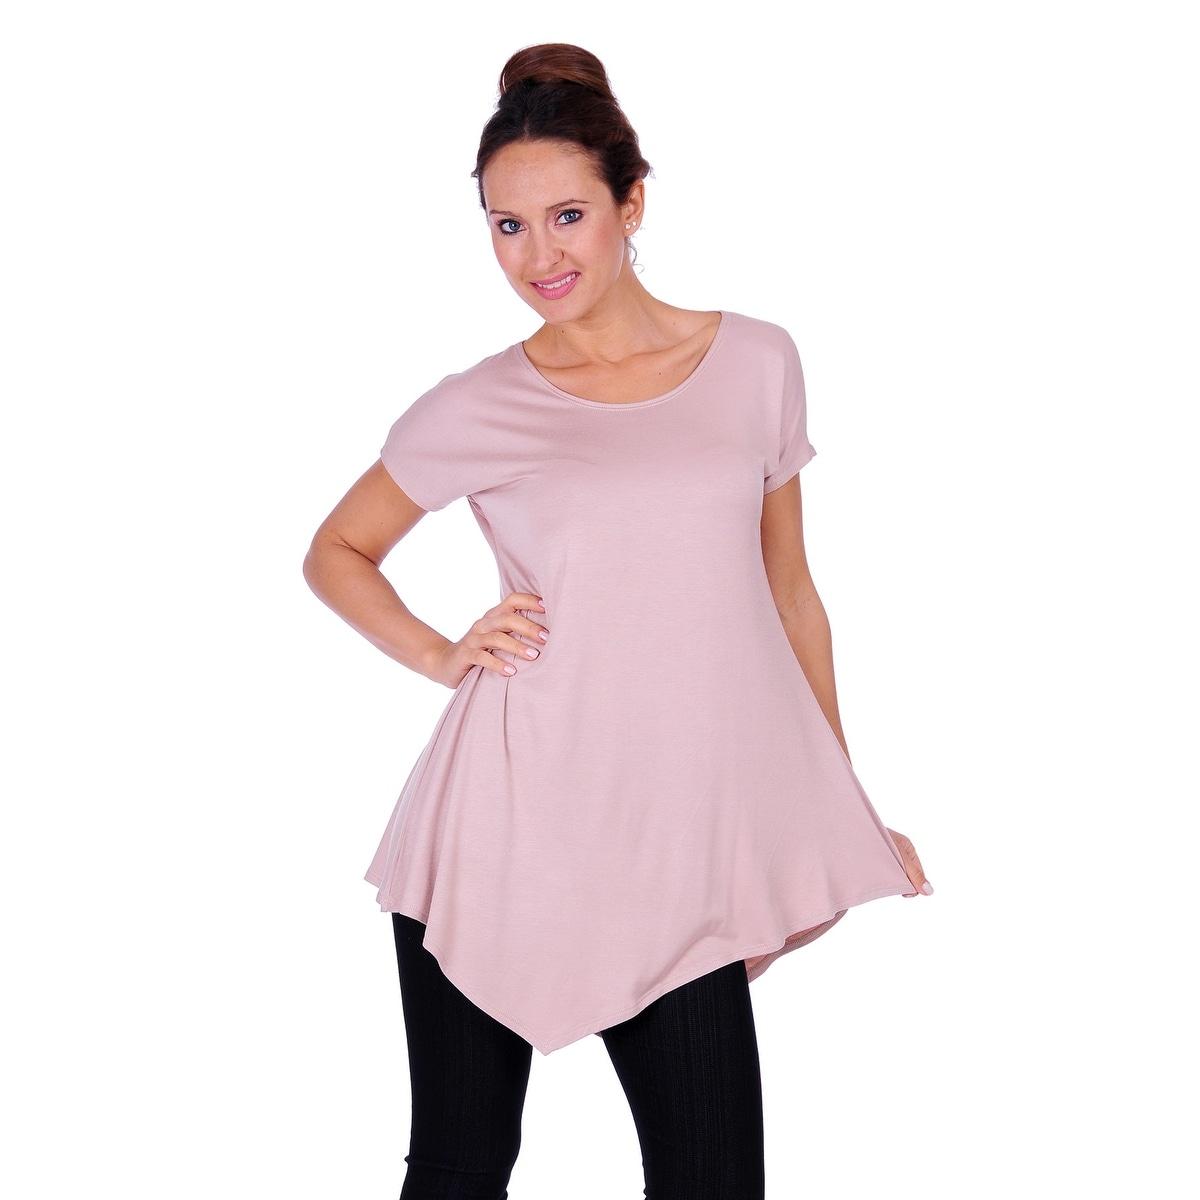 Simply Ravishing Women's Assymetrical Front/Back Handkerchief Hem Sleeveless Tunic Top - Thumbnail 12